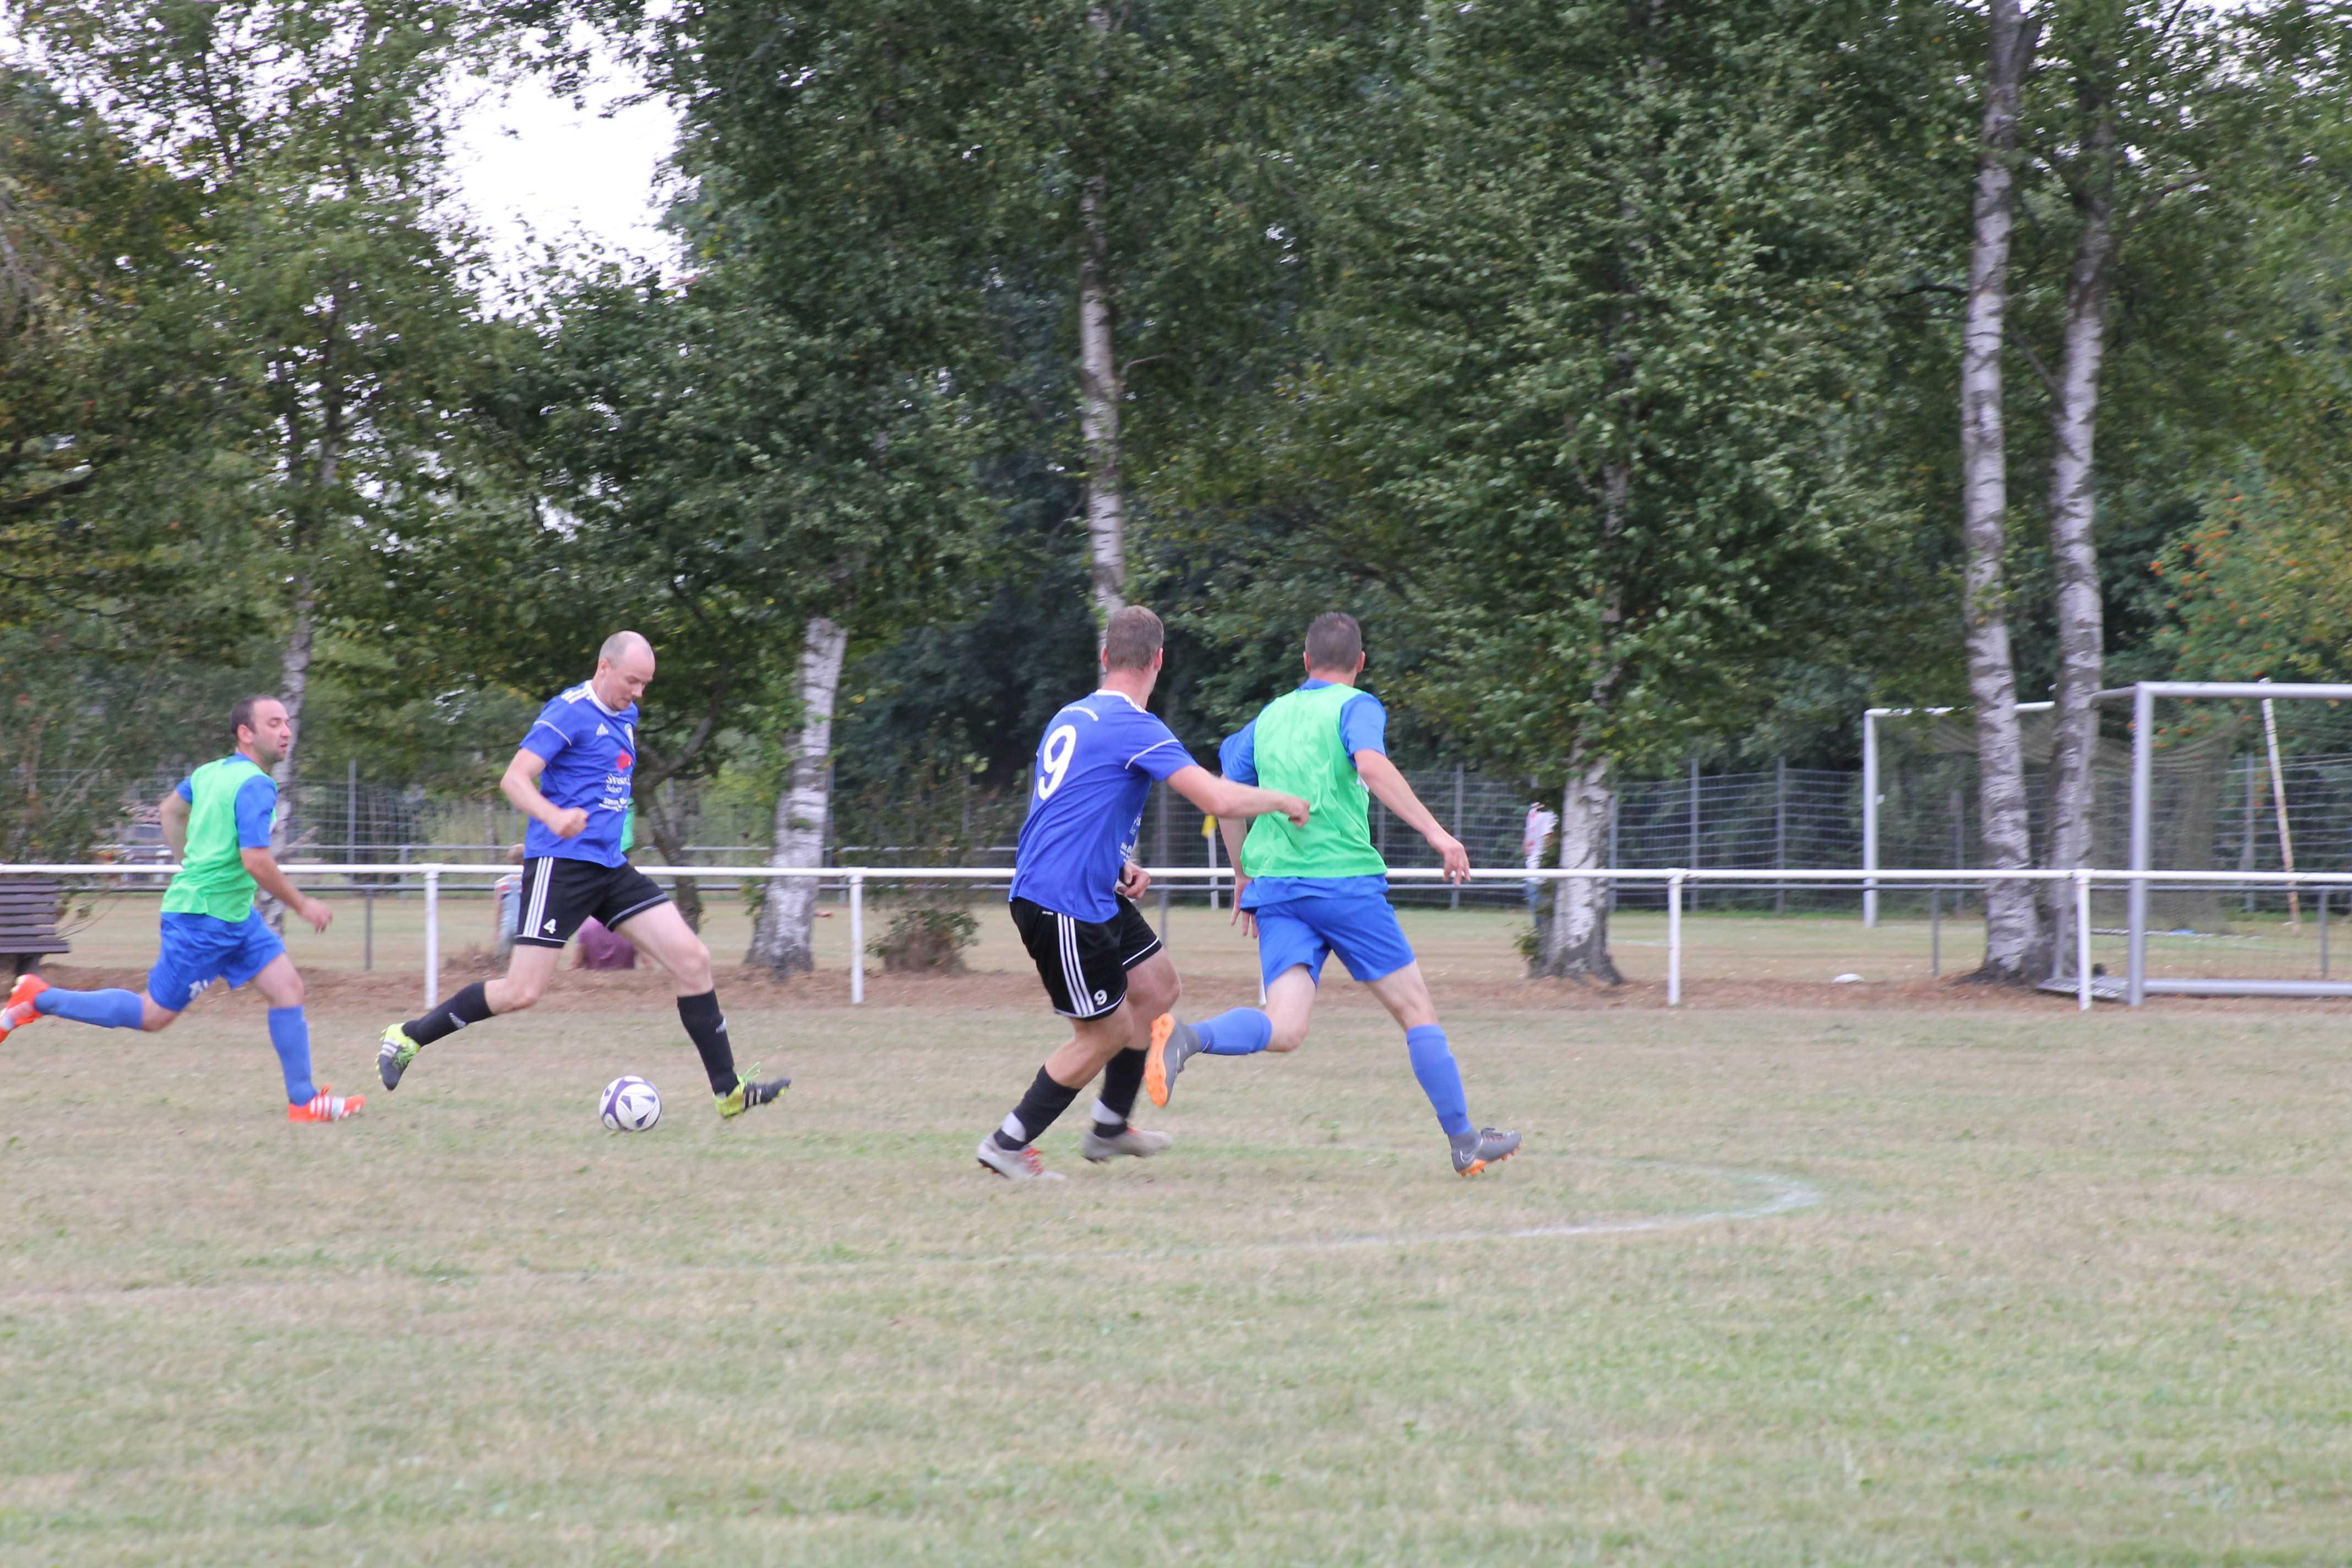 2018-07-29 Sportwoche - Sportpicknick & Football & Fußball (112)